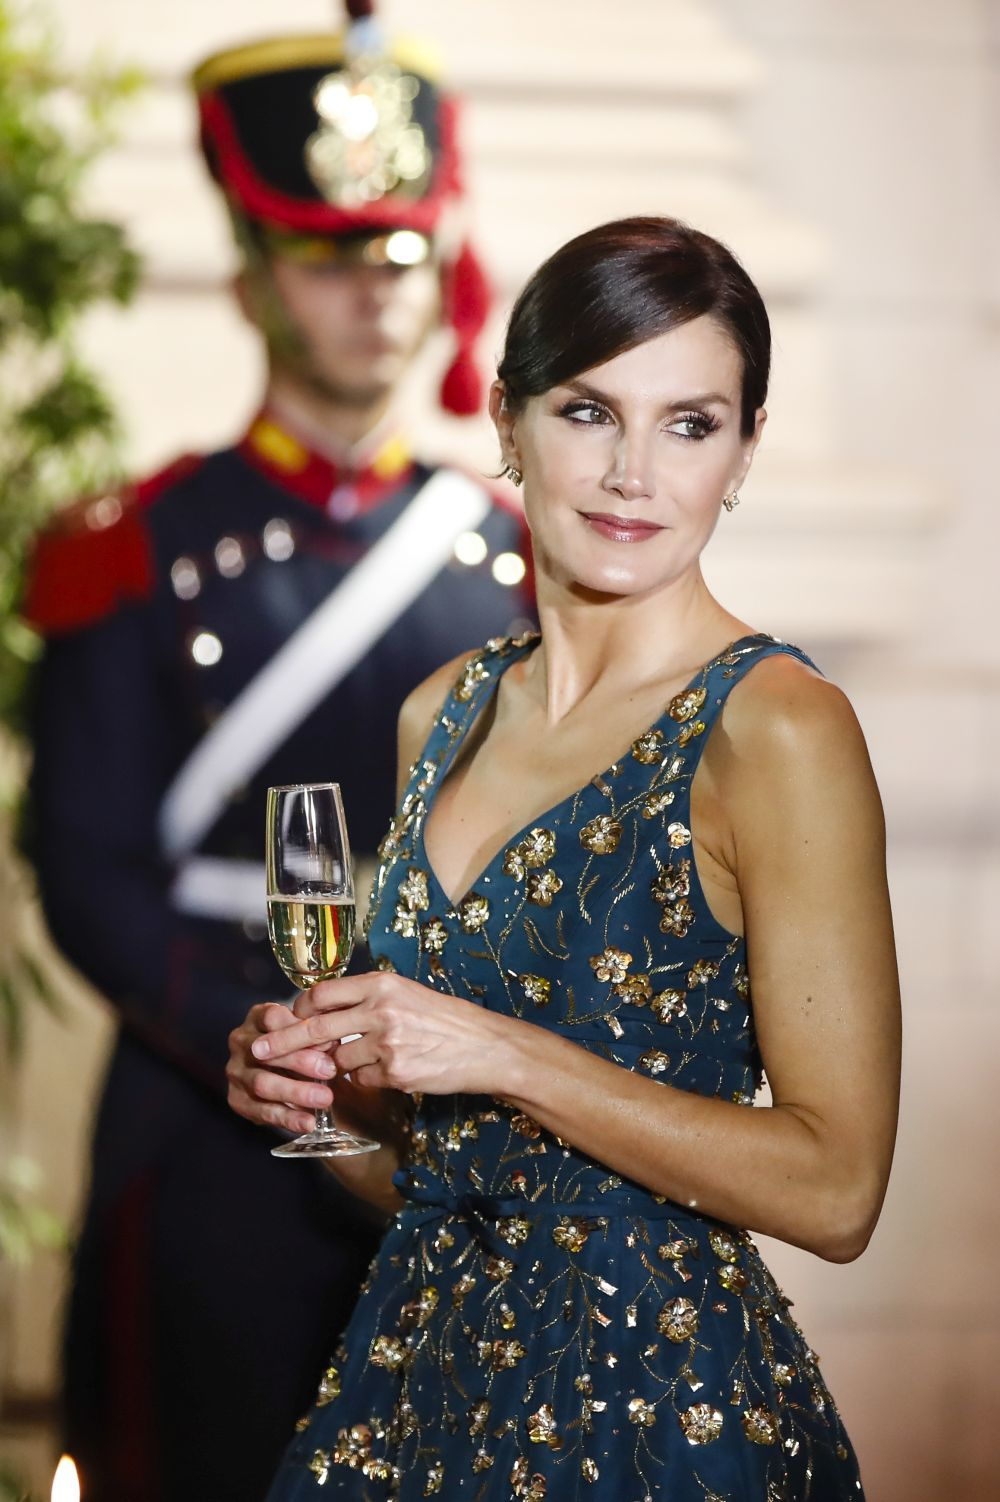 La reina Letizia en Argentina, de cena de gala.